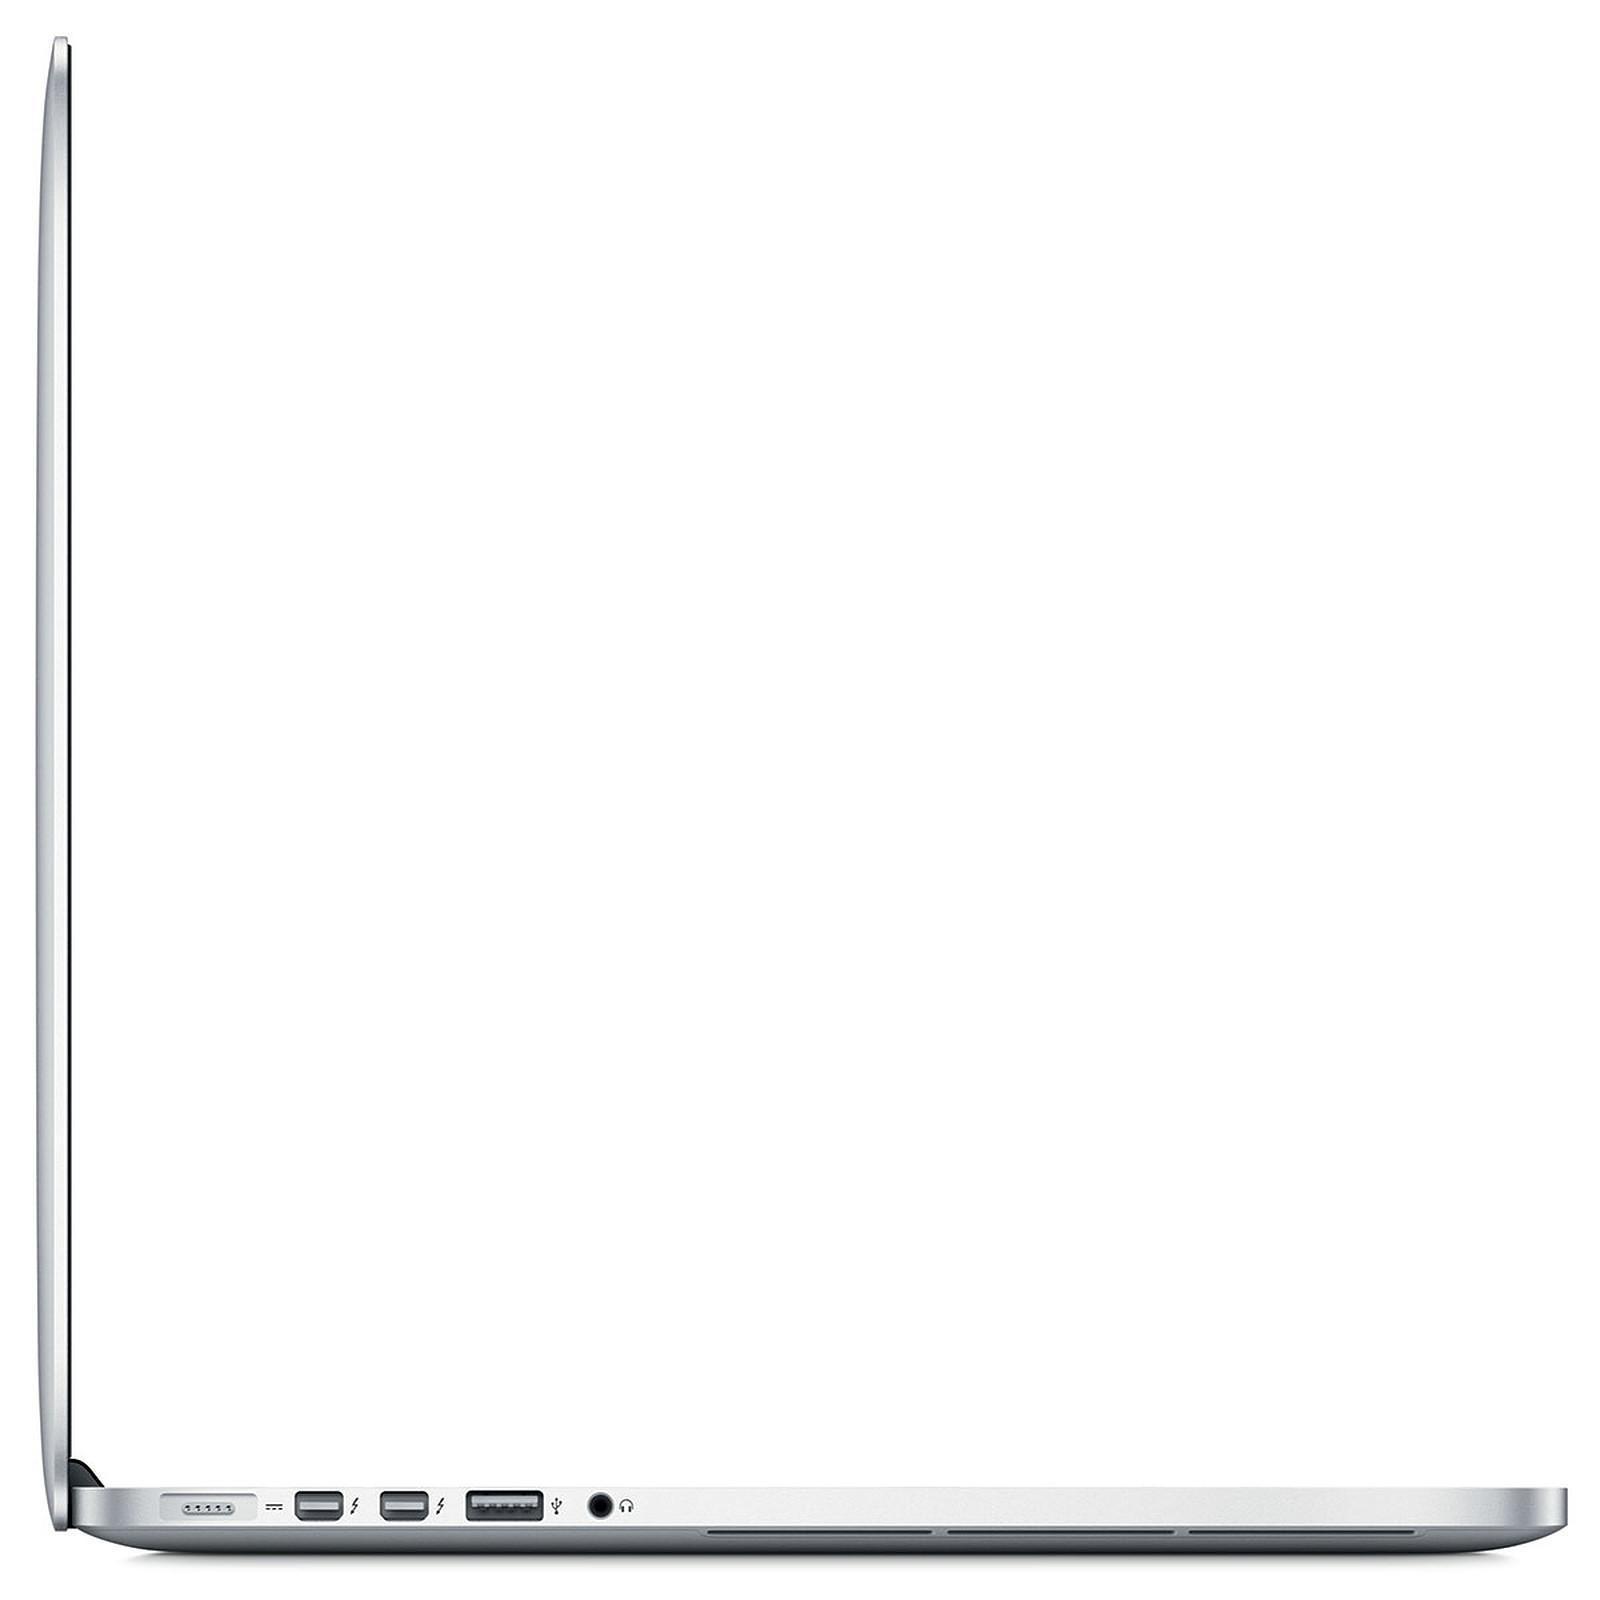 MacBook Pro Retina 15,4-tum (2013) - Core i7 - 16GB - SSD 500 GB QWERTY - Nederländska